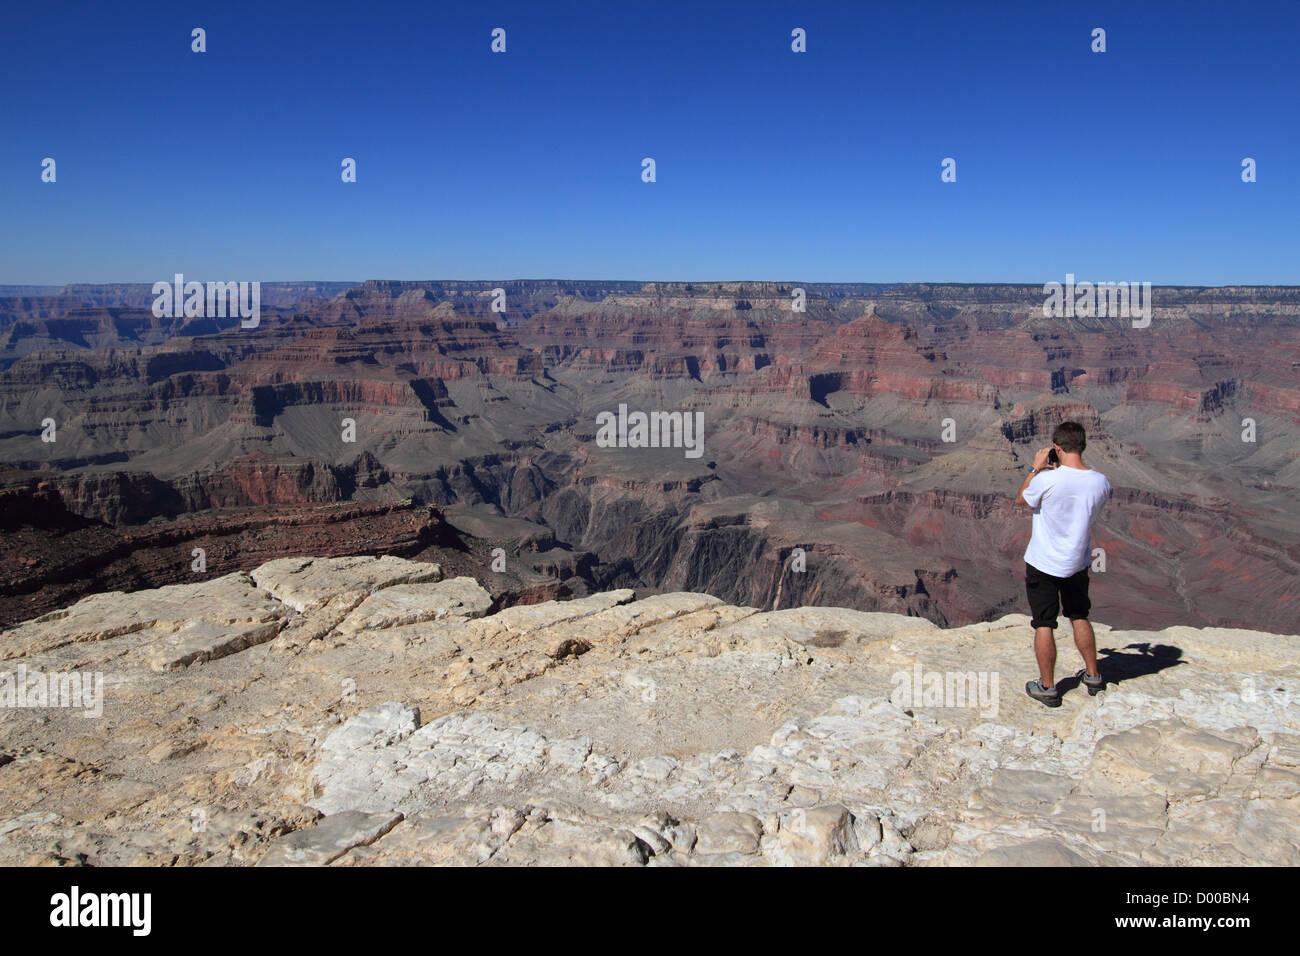 A tourist (not identifiable) photographing Grand Canyon at the South Rim. Grand Canyon, Arizona, USA Stock Photo